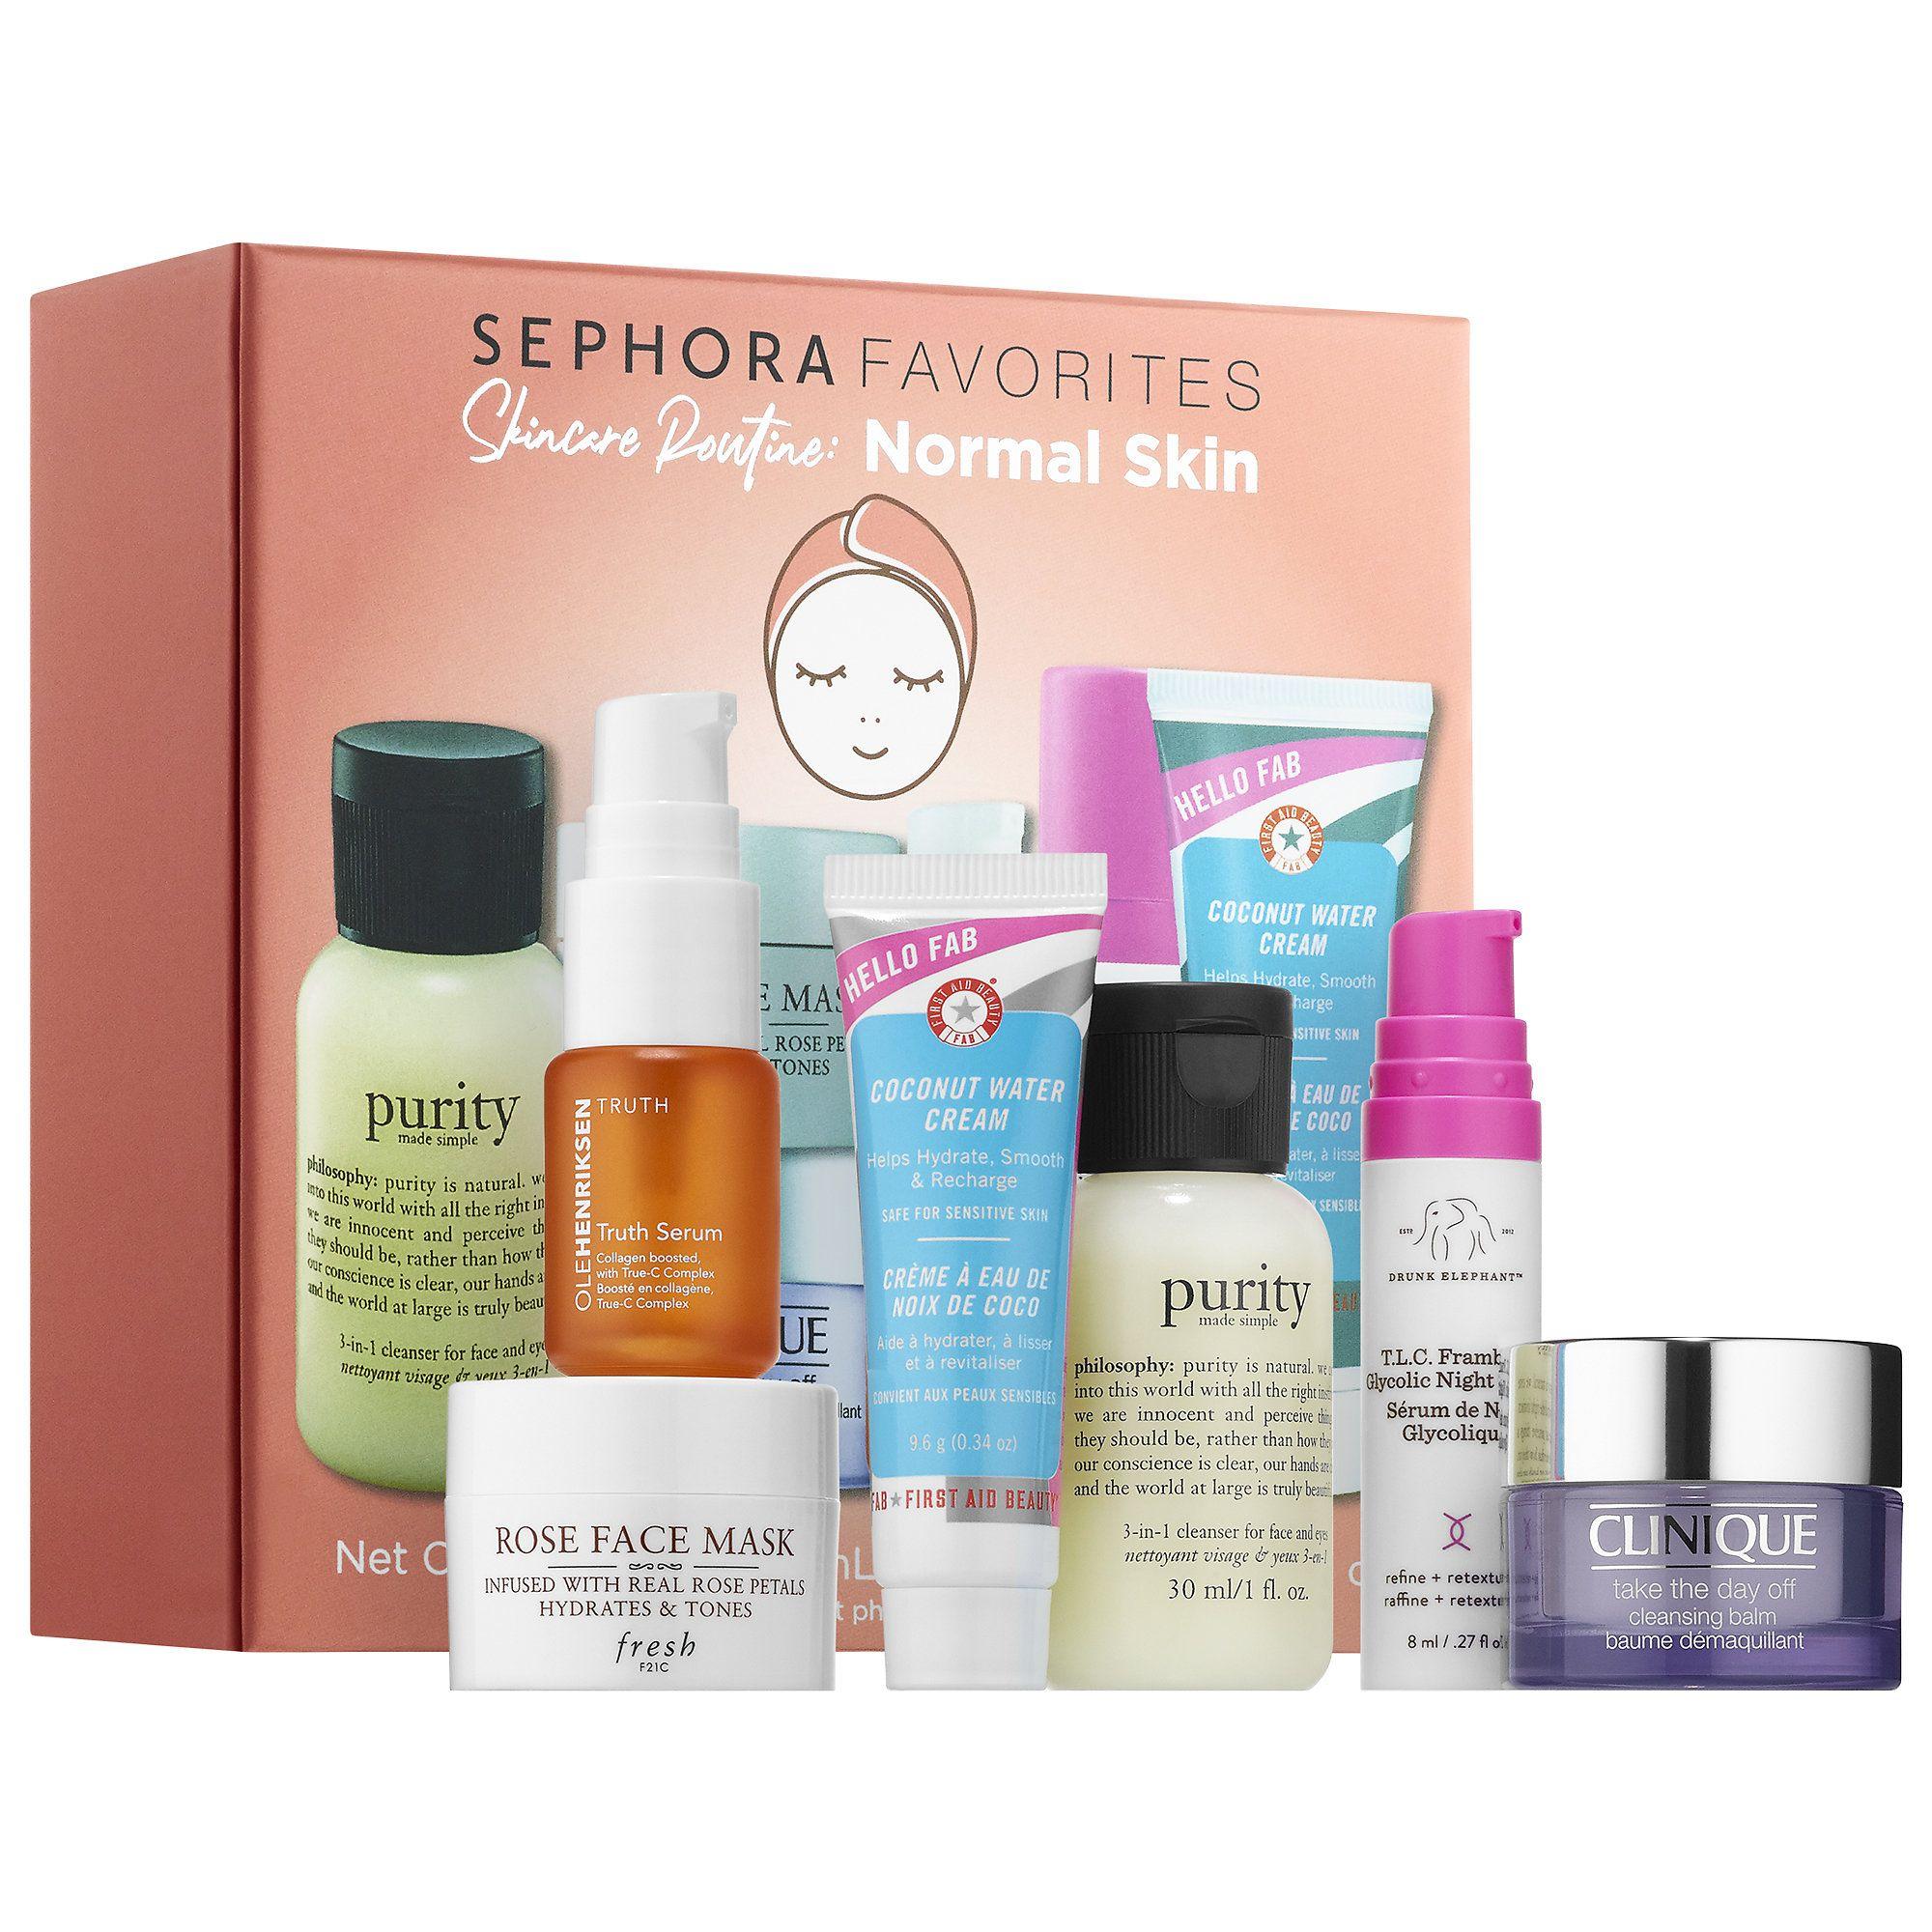 Sephora Favorites Set Skincare Routine Normal Skin New For